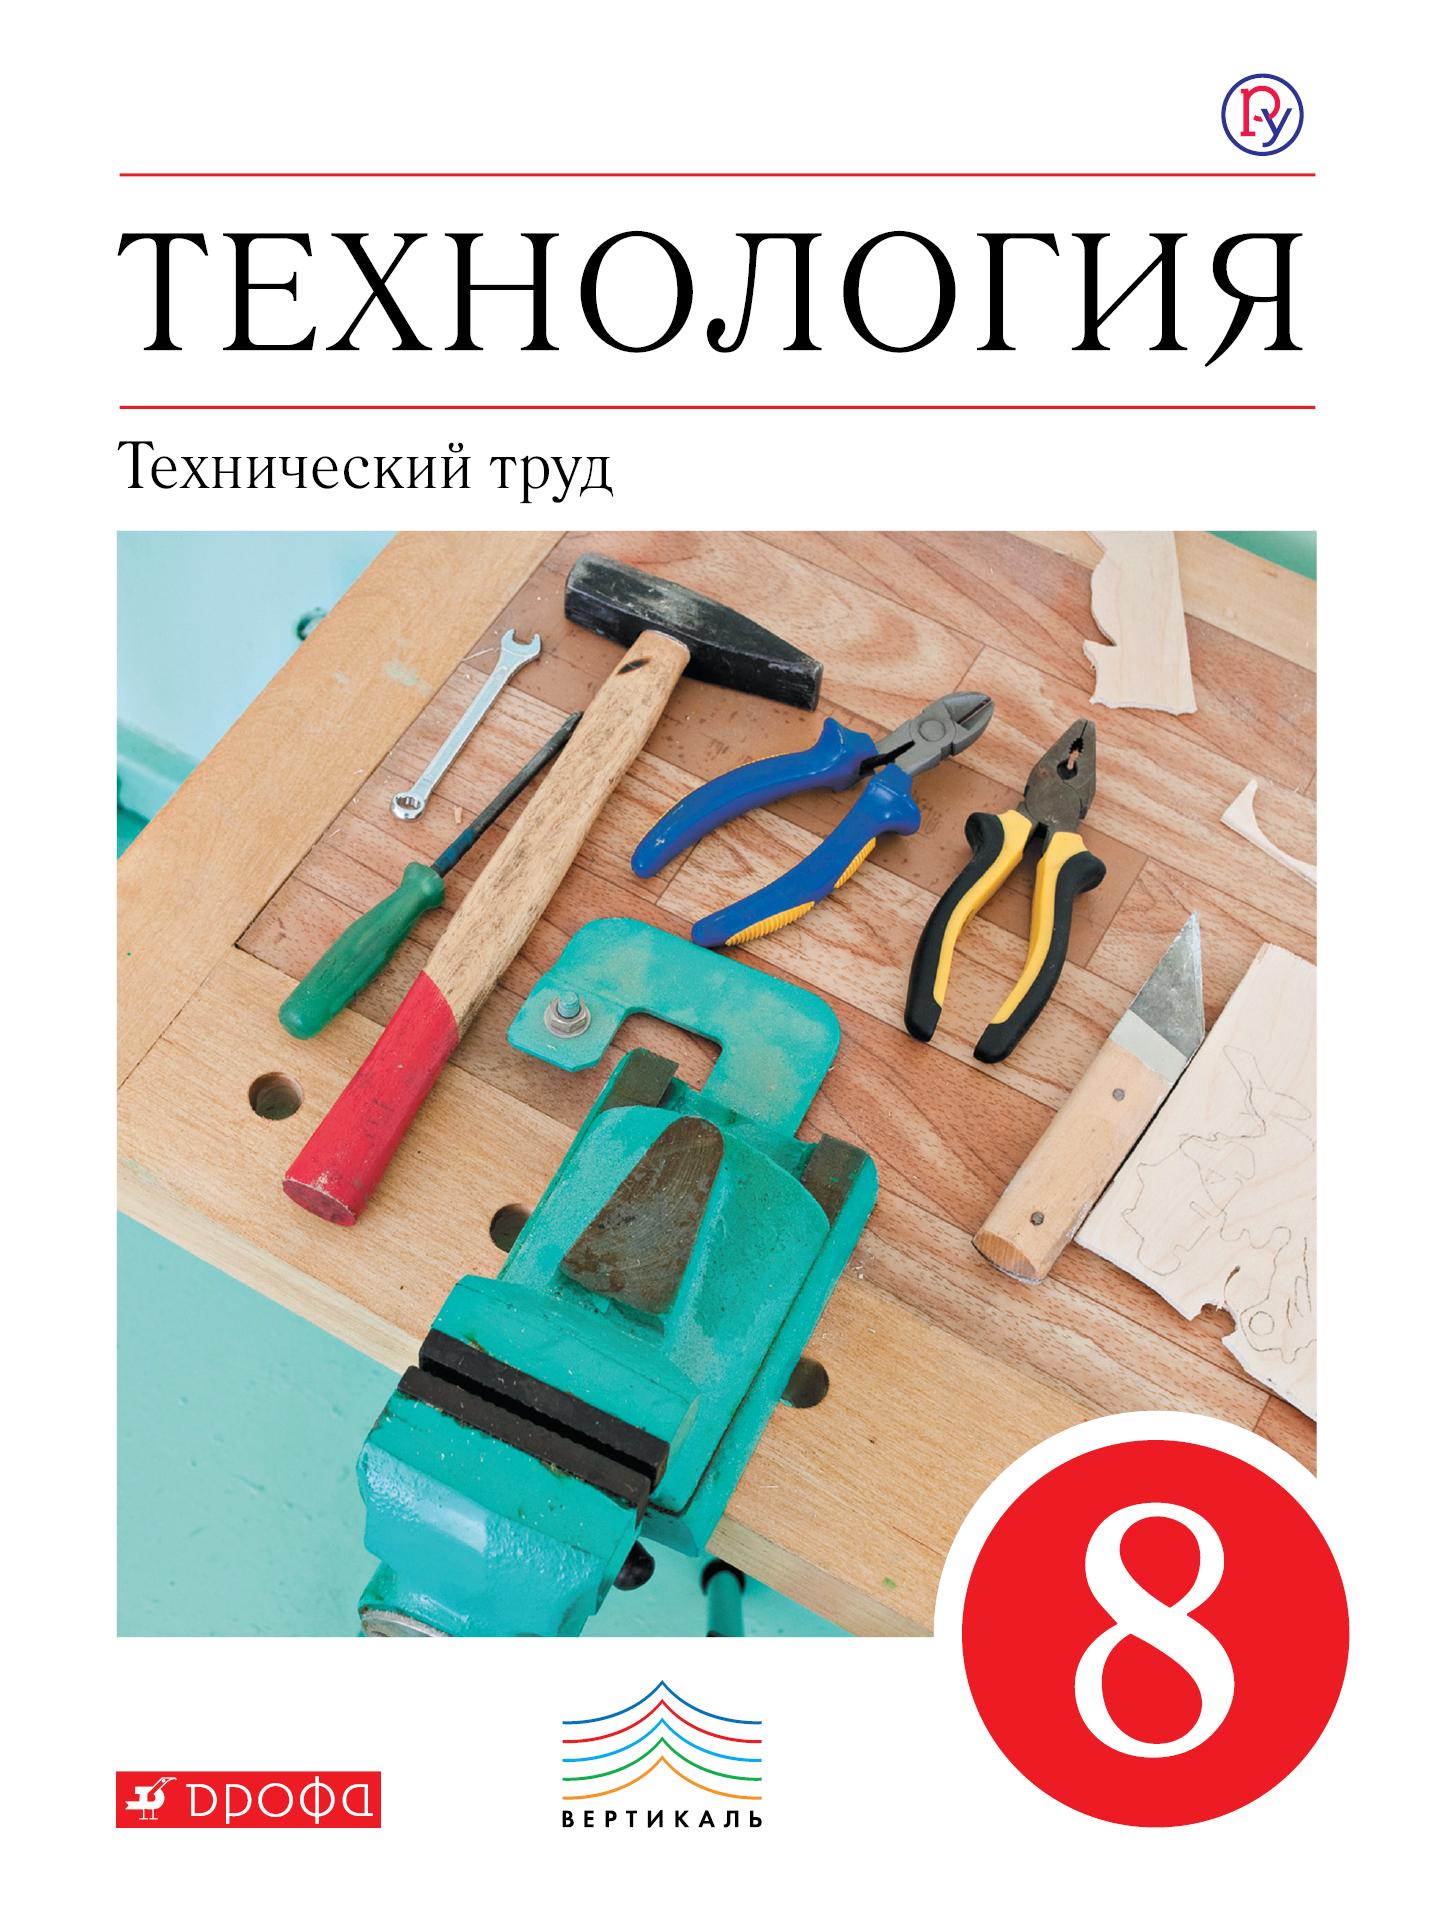 Технология. Технический труд. 8 класс. Учебник.